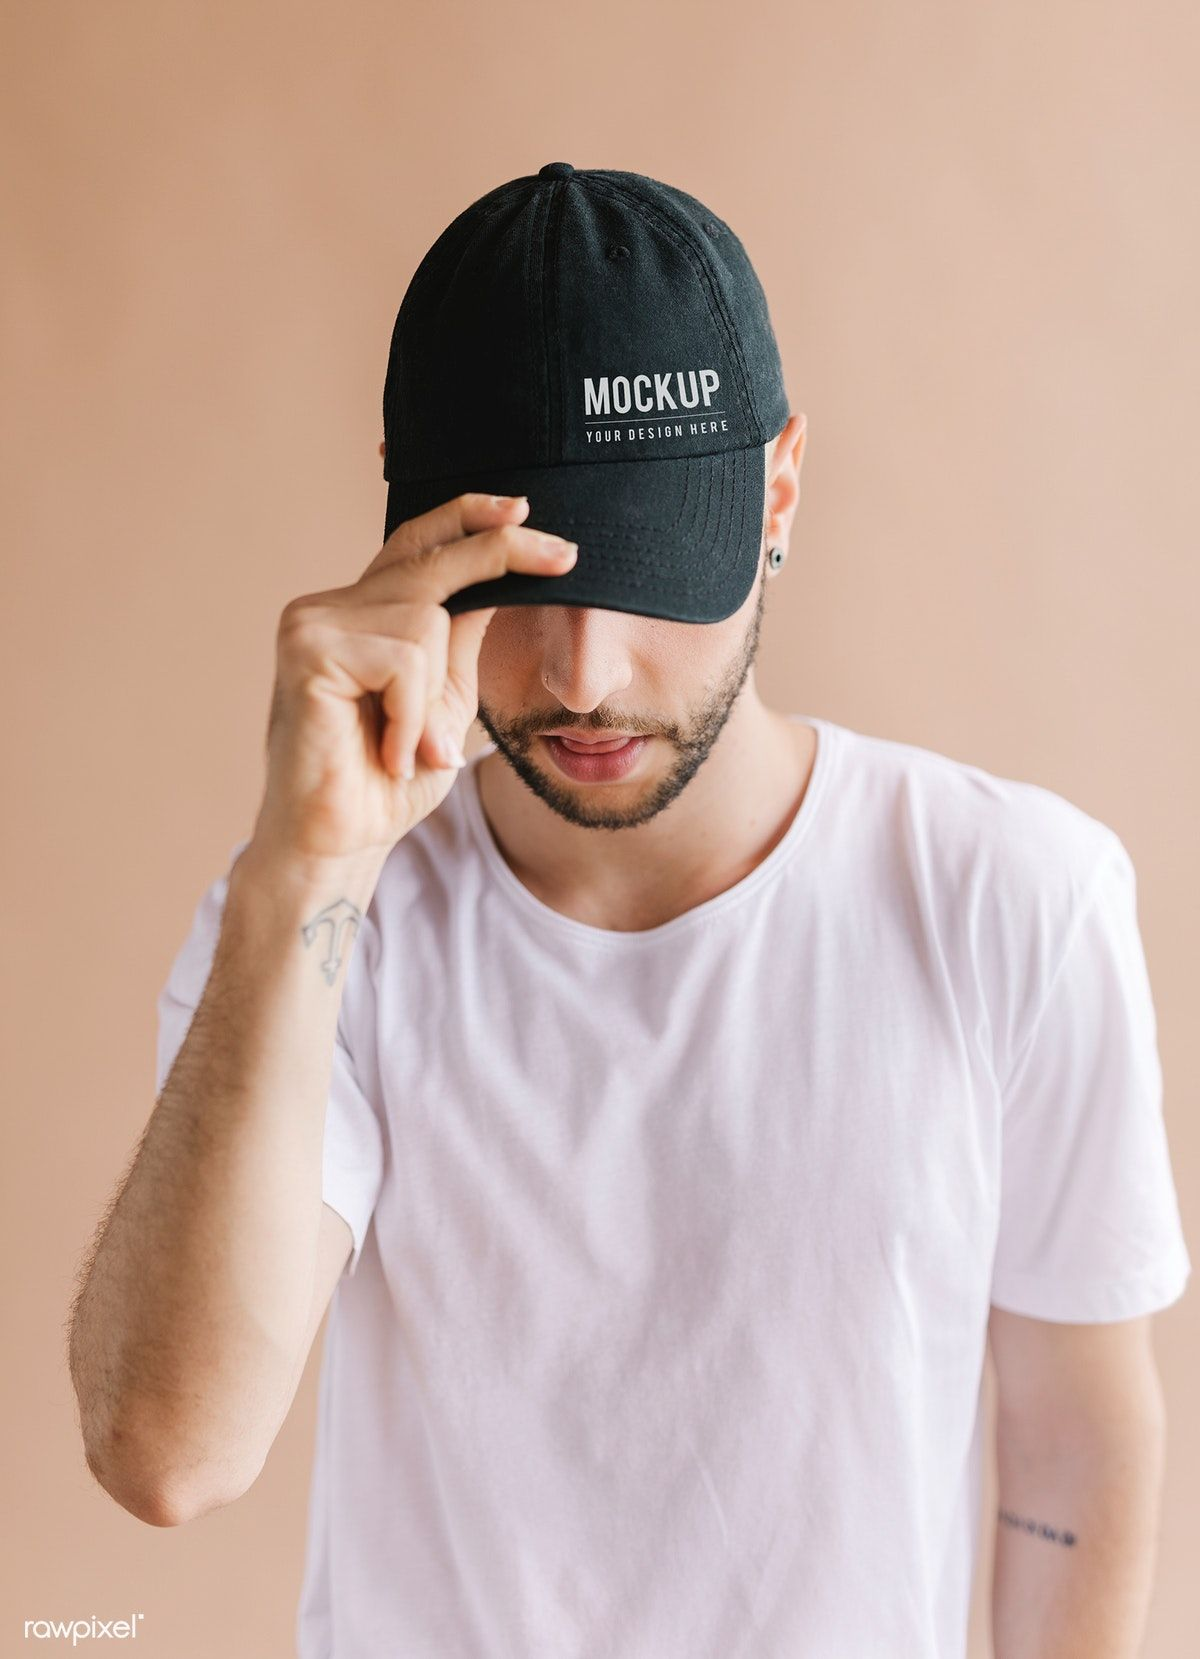 Download Premium Psd Of Man With A Black Cap Mockup 1235598 Black Cap Grey Long Sleeve Shirt Shirt Mockup